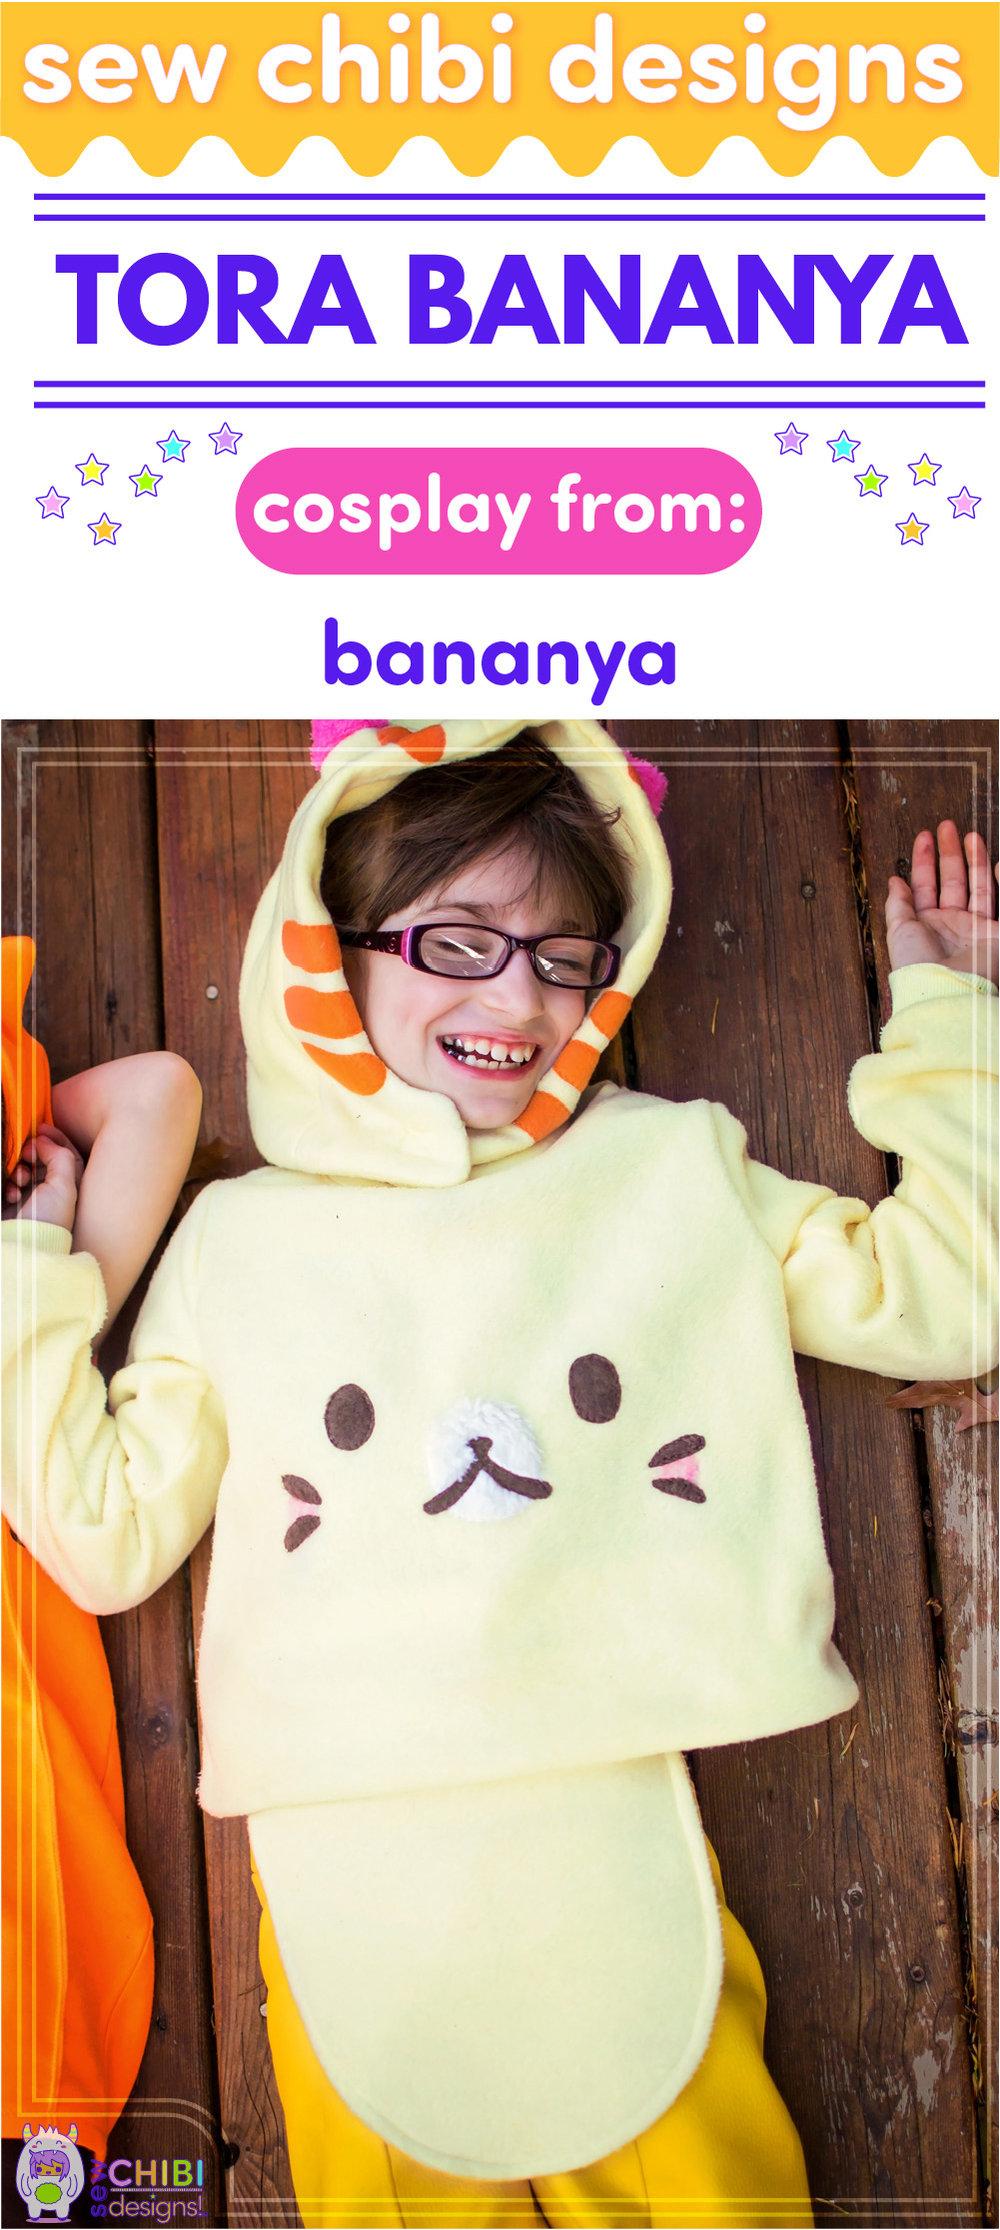 Tora ( とら ねこ ) Bananya chibi cosplay from Crunchyroll's Bananya ( ばなにゃ ) sewn by Sew Chibi Designs for Sew Geeky